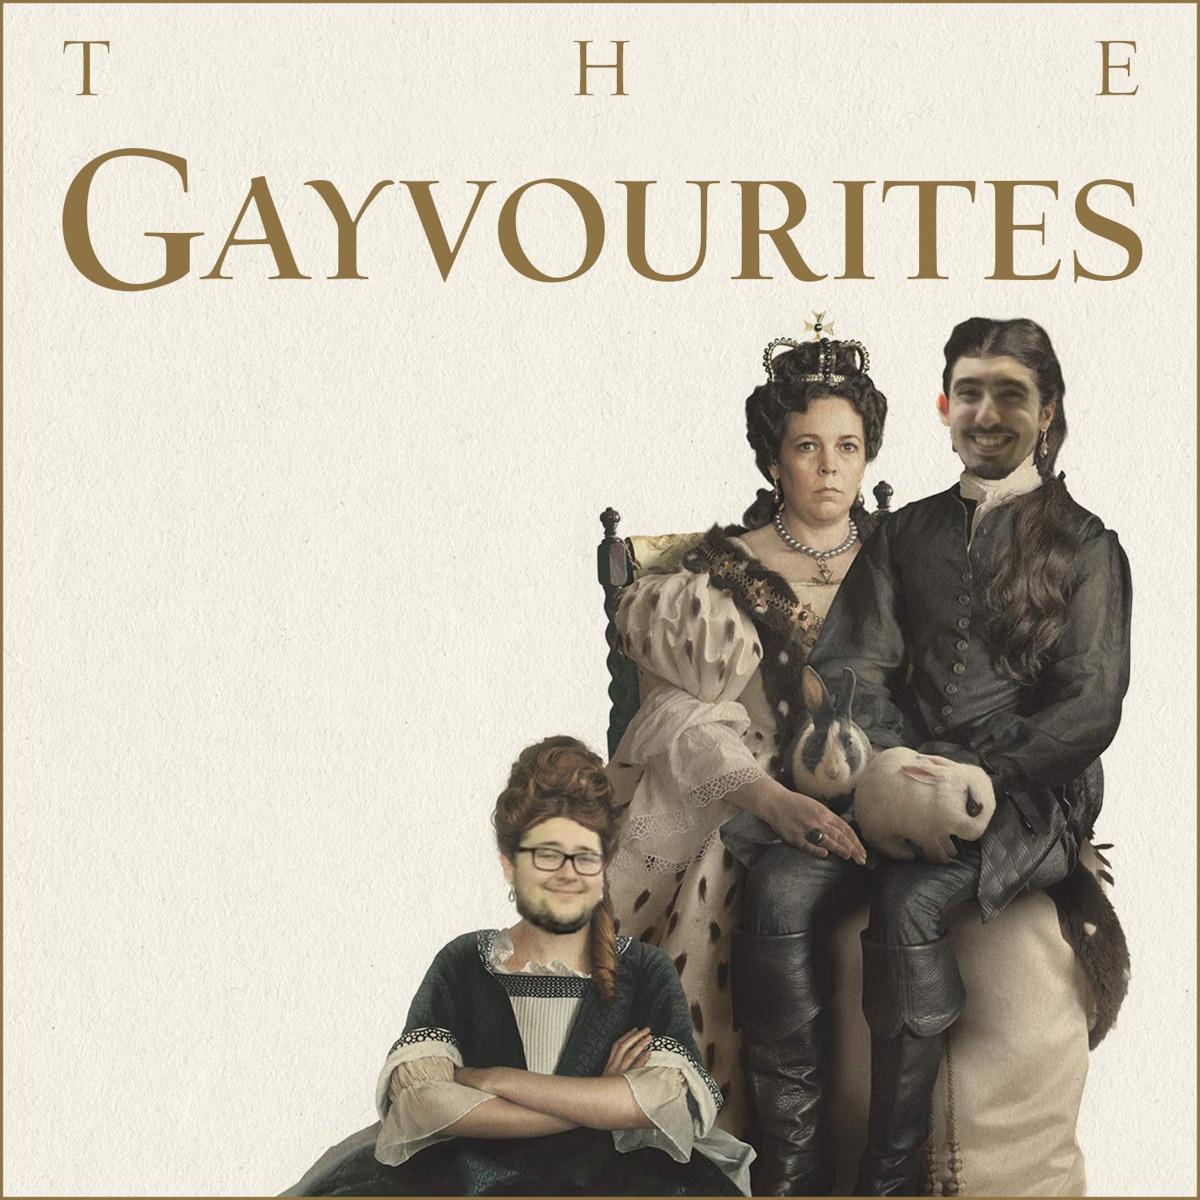 The Gayvourites